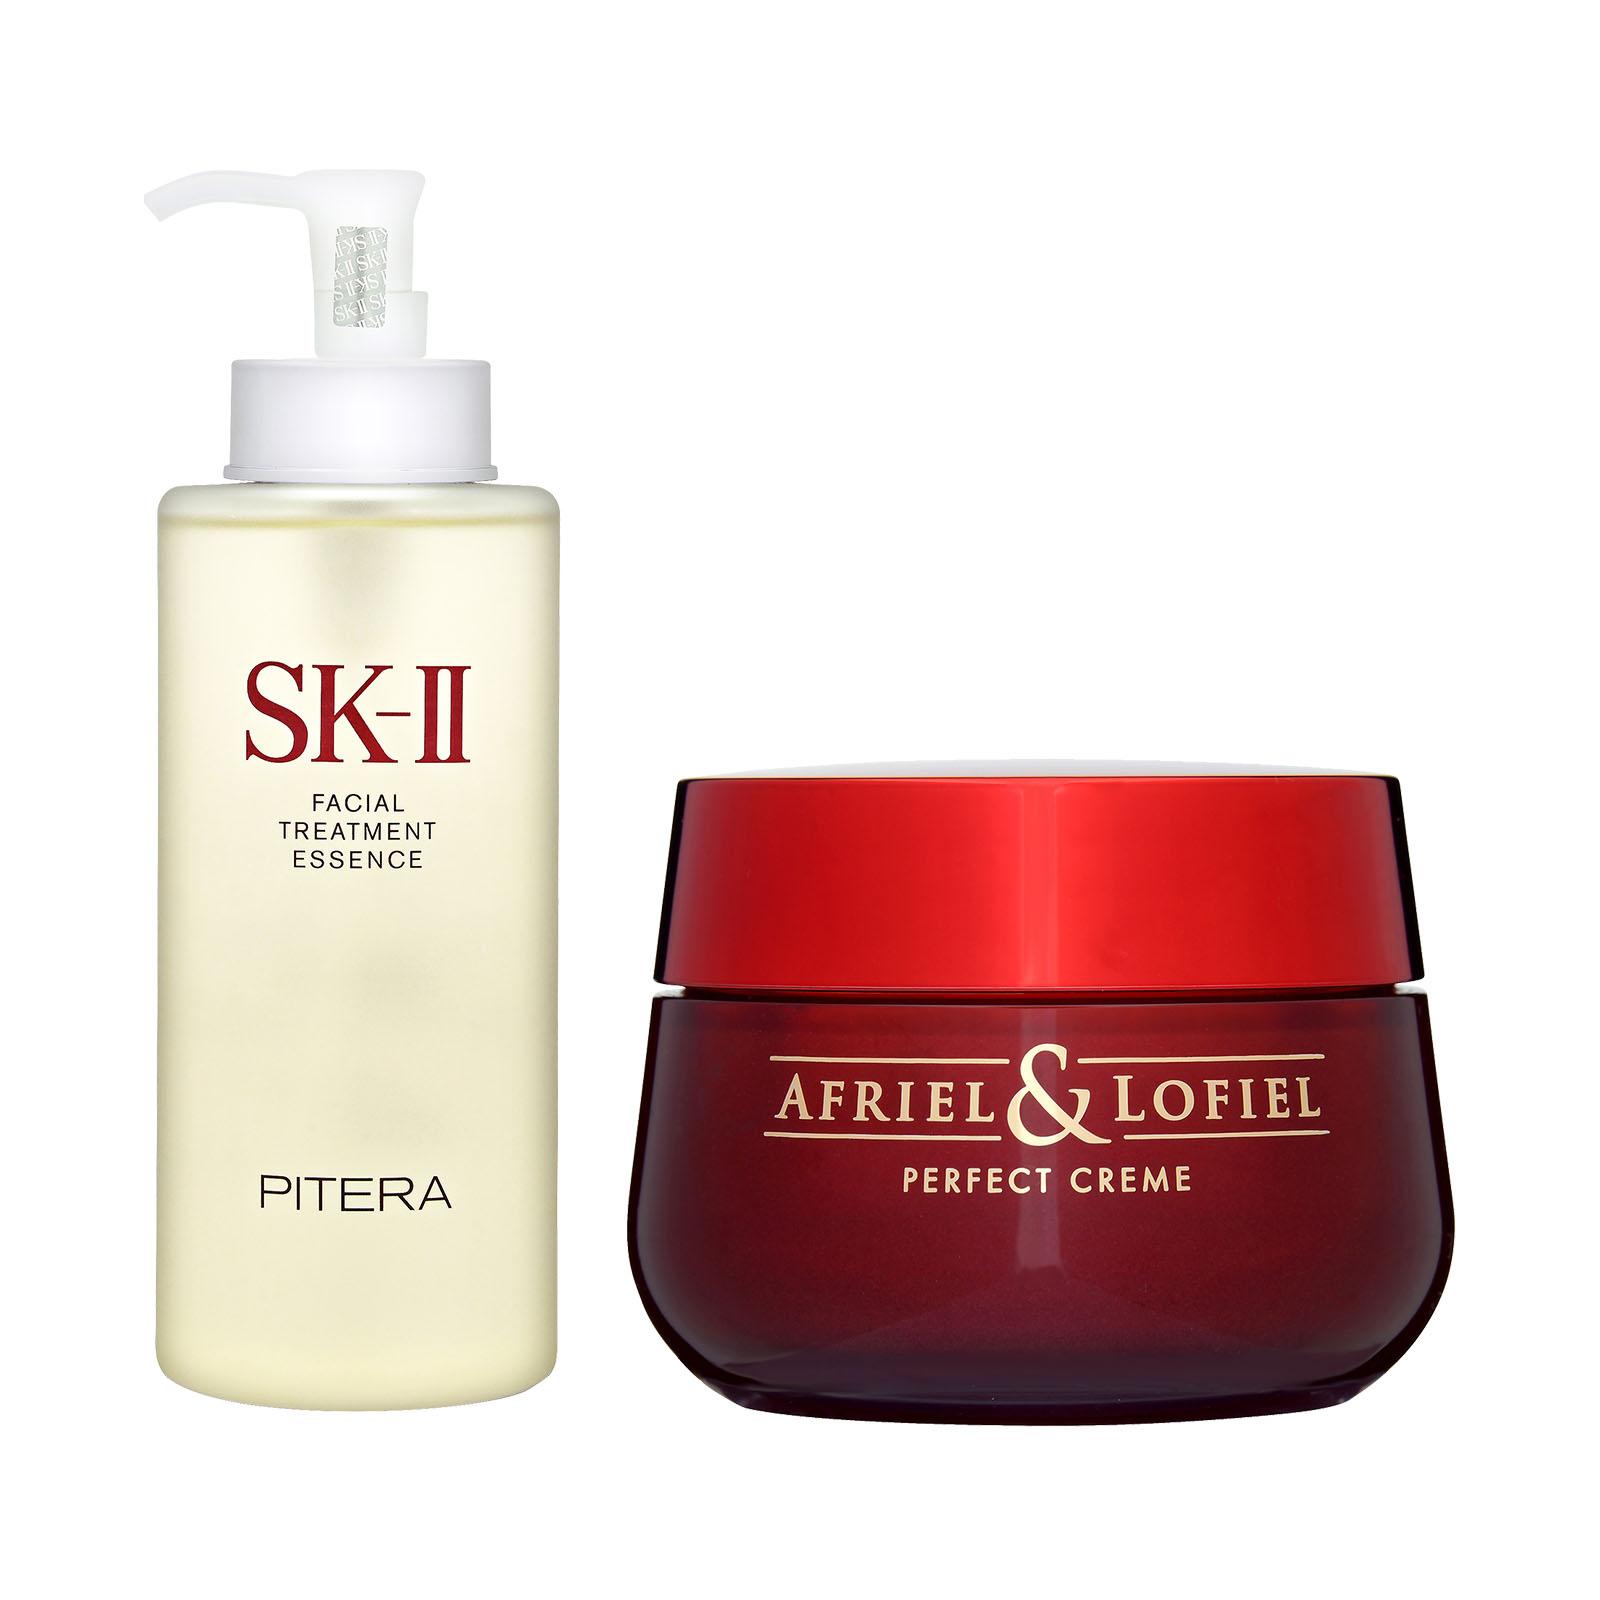 Details about SET SK-II Facial Treatment Essence 330ml + Afriel & Lofiel Perfect Cream 50g